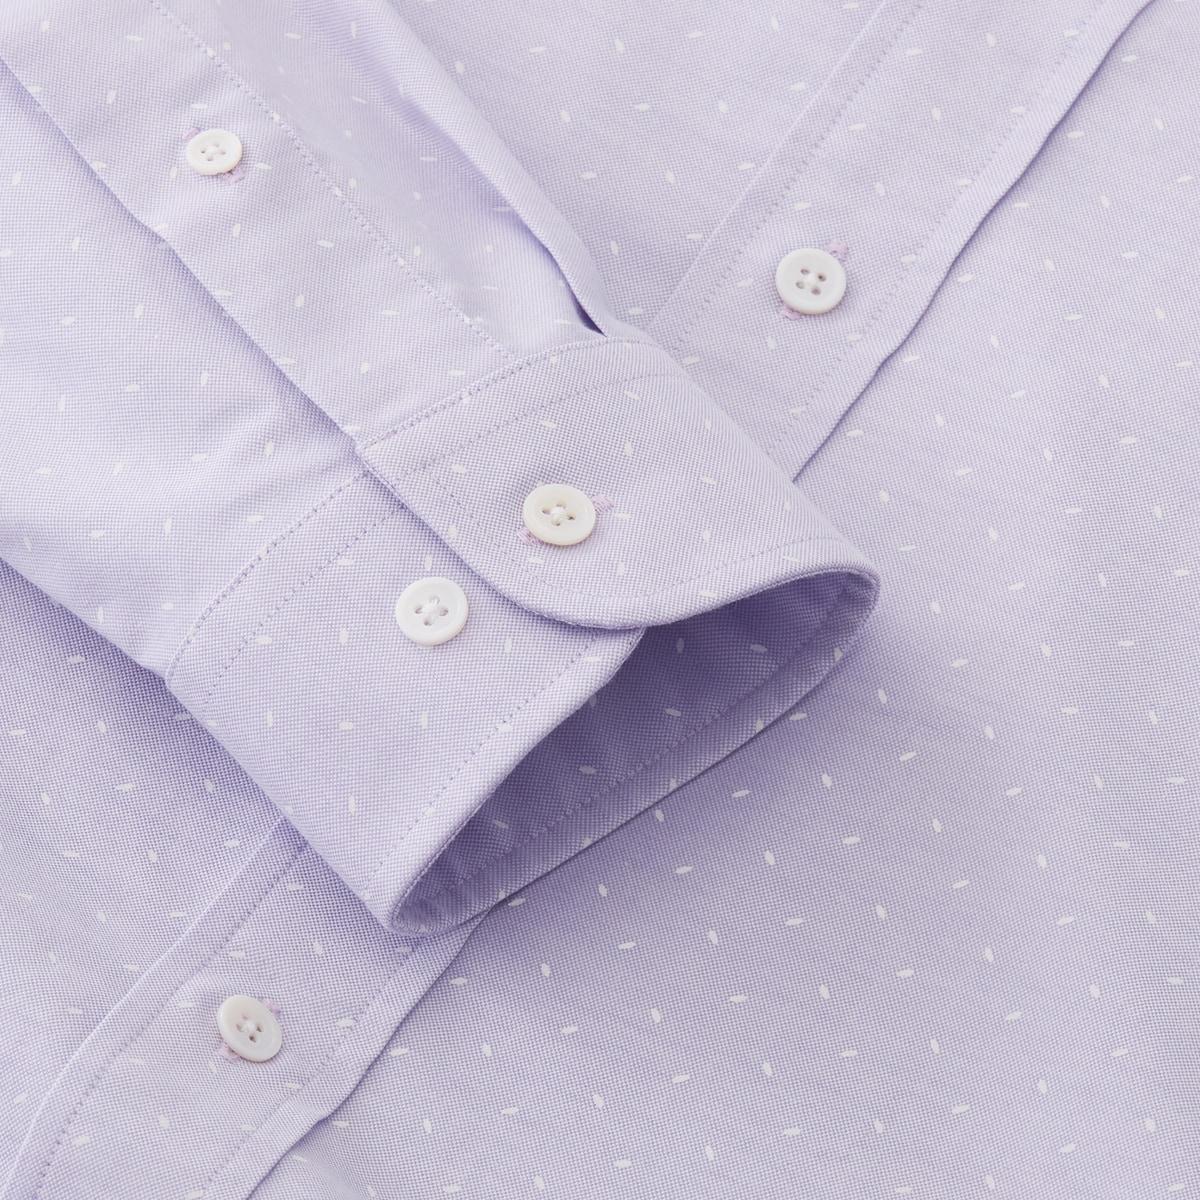 Oxford Shirt with Overprint-Previous Season Style